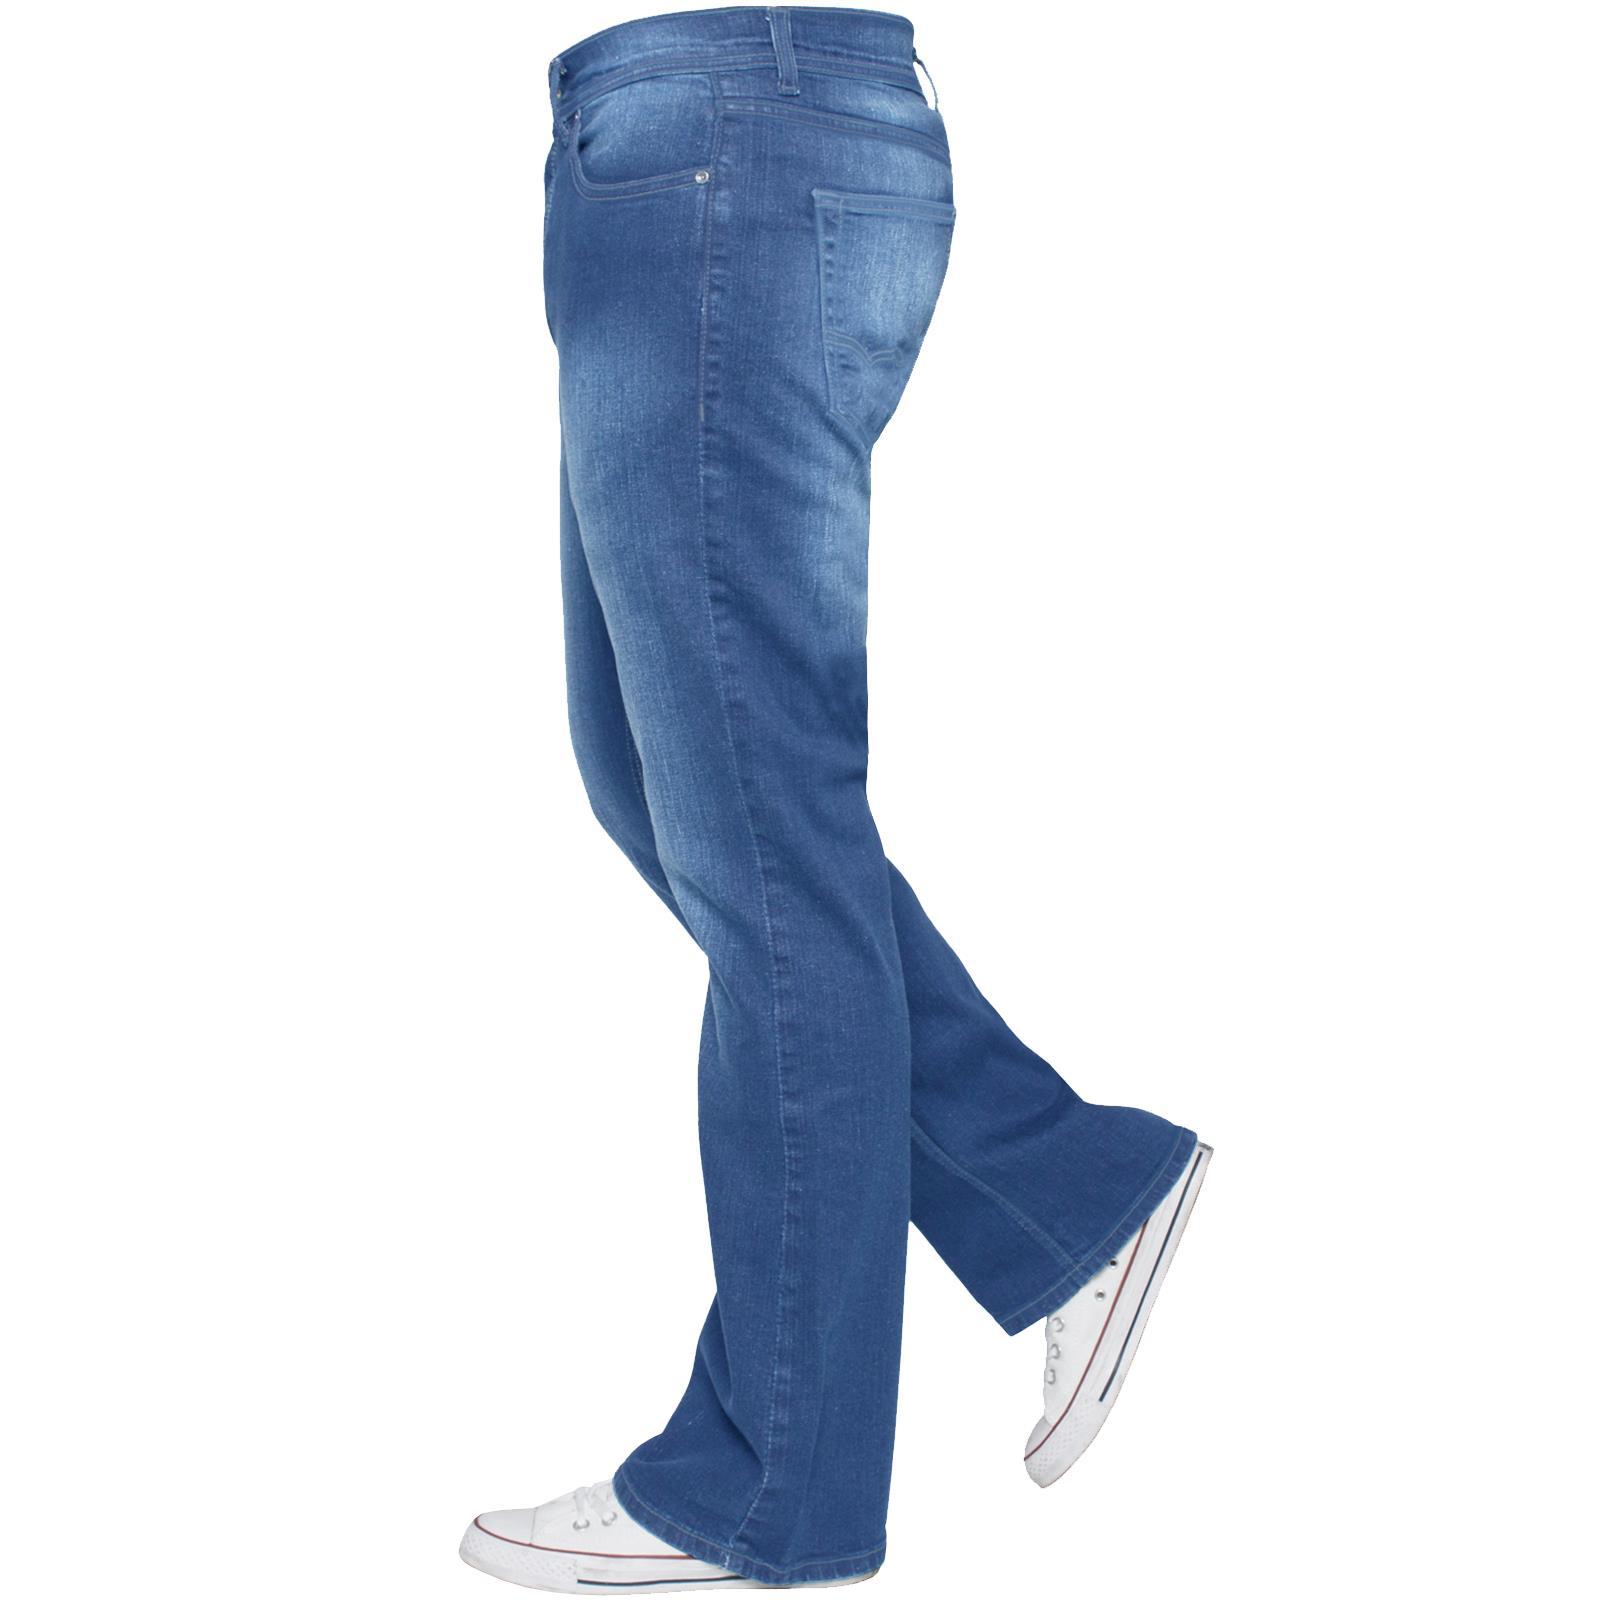 Para-Hombre-Recto-Bootcut-Stretch-Jeans-Pantalones-Regular-Fit-Grande-Alto-Todas-Cinturas miniatura 43